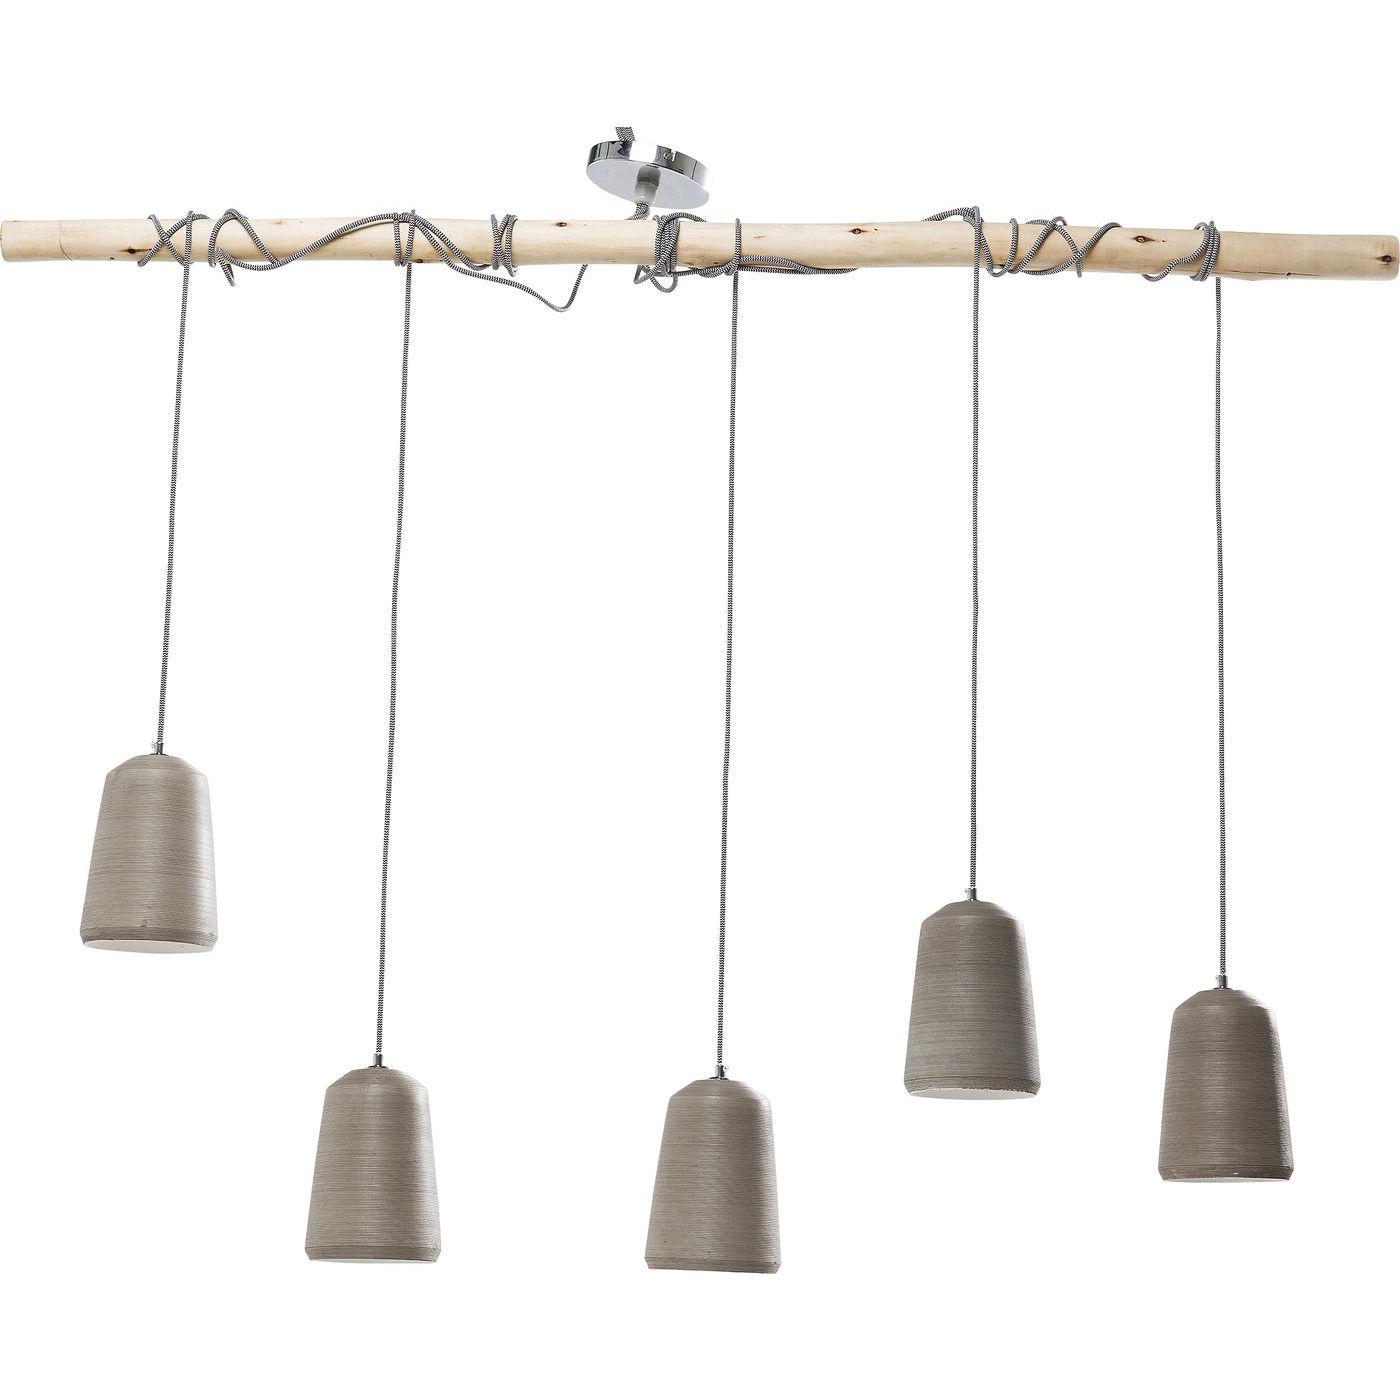 kare design – Kare design dining concrete cinque loftlampe - grå beton/natur eucalyptus fra boboonline.dk